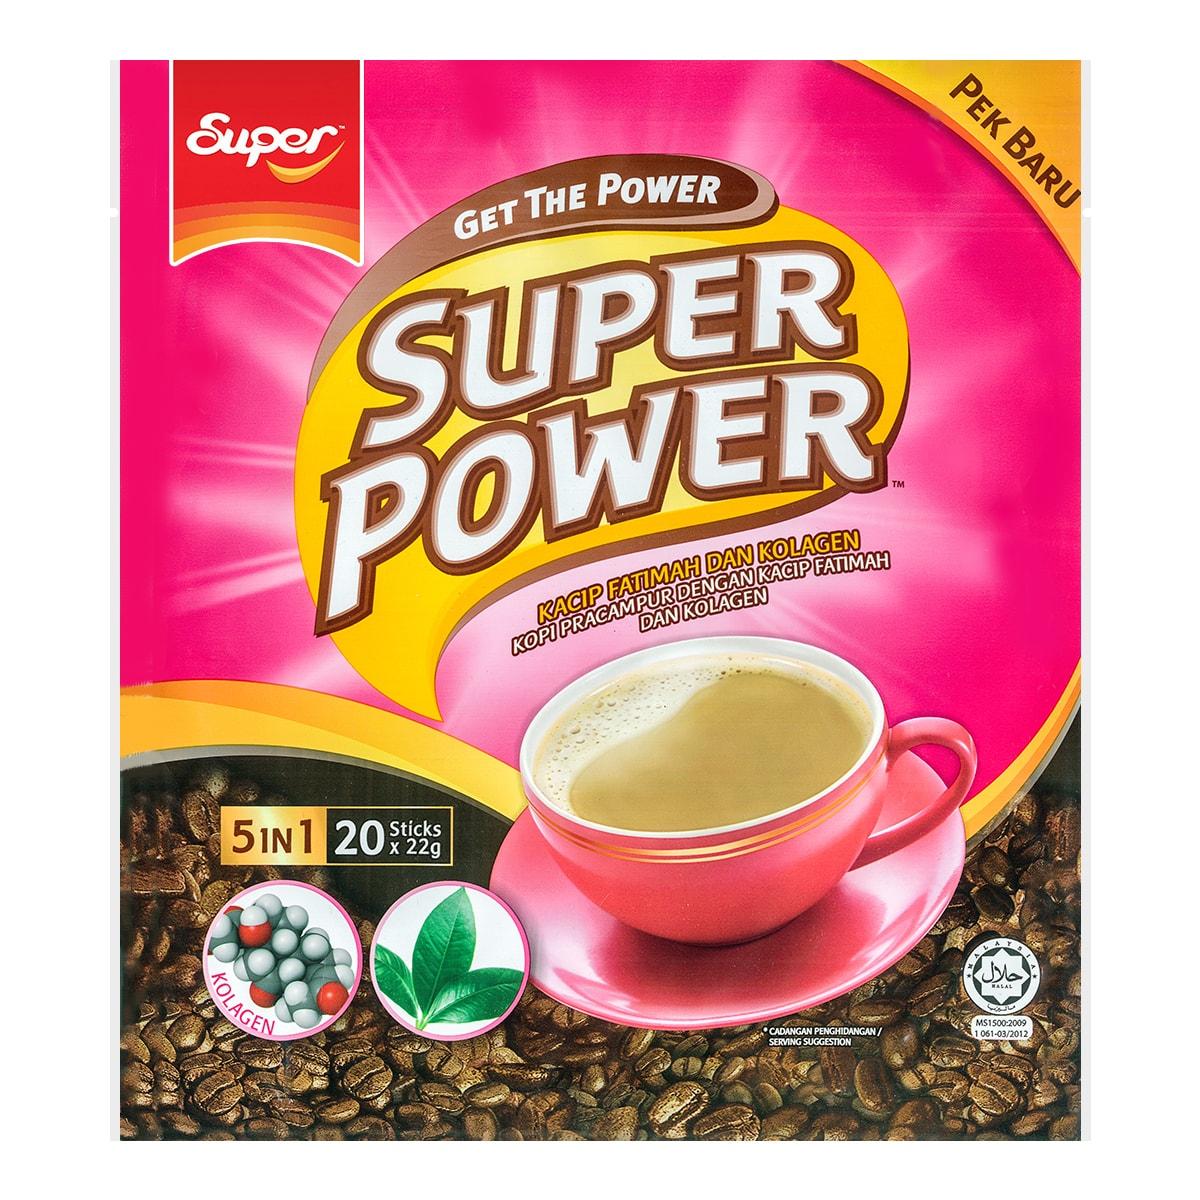 SUPER Power 5in1 Kacip Fatimah & Collagen 22g*20Sticks